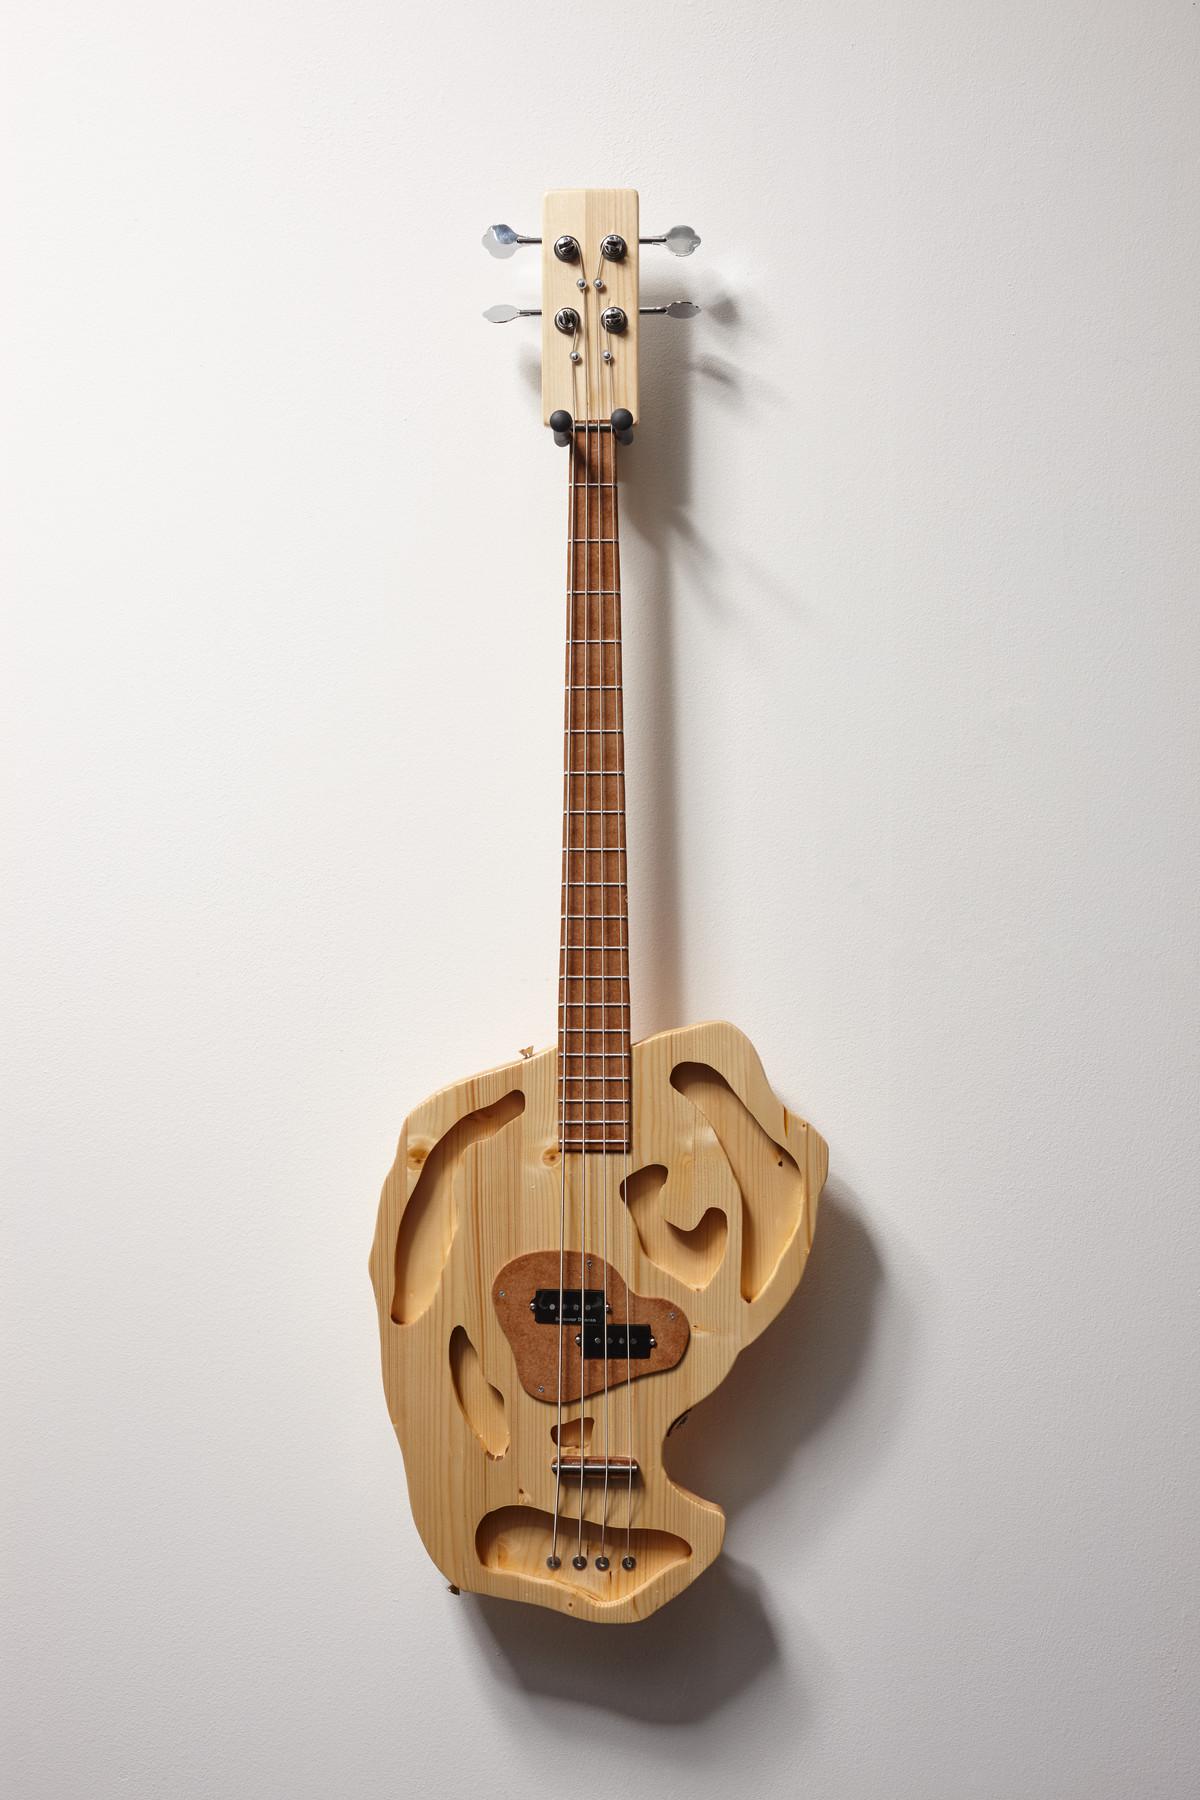 Flavio Merlo - Bass II, 2015